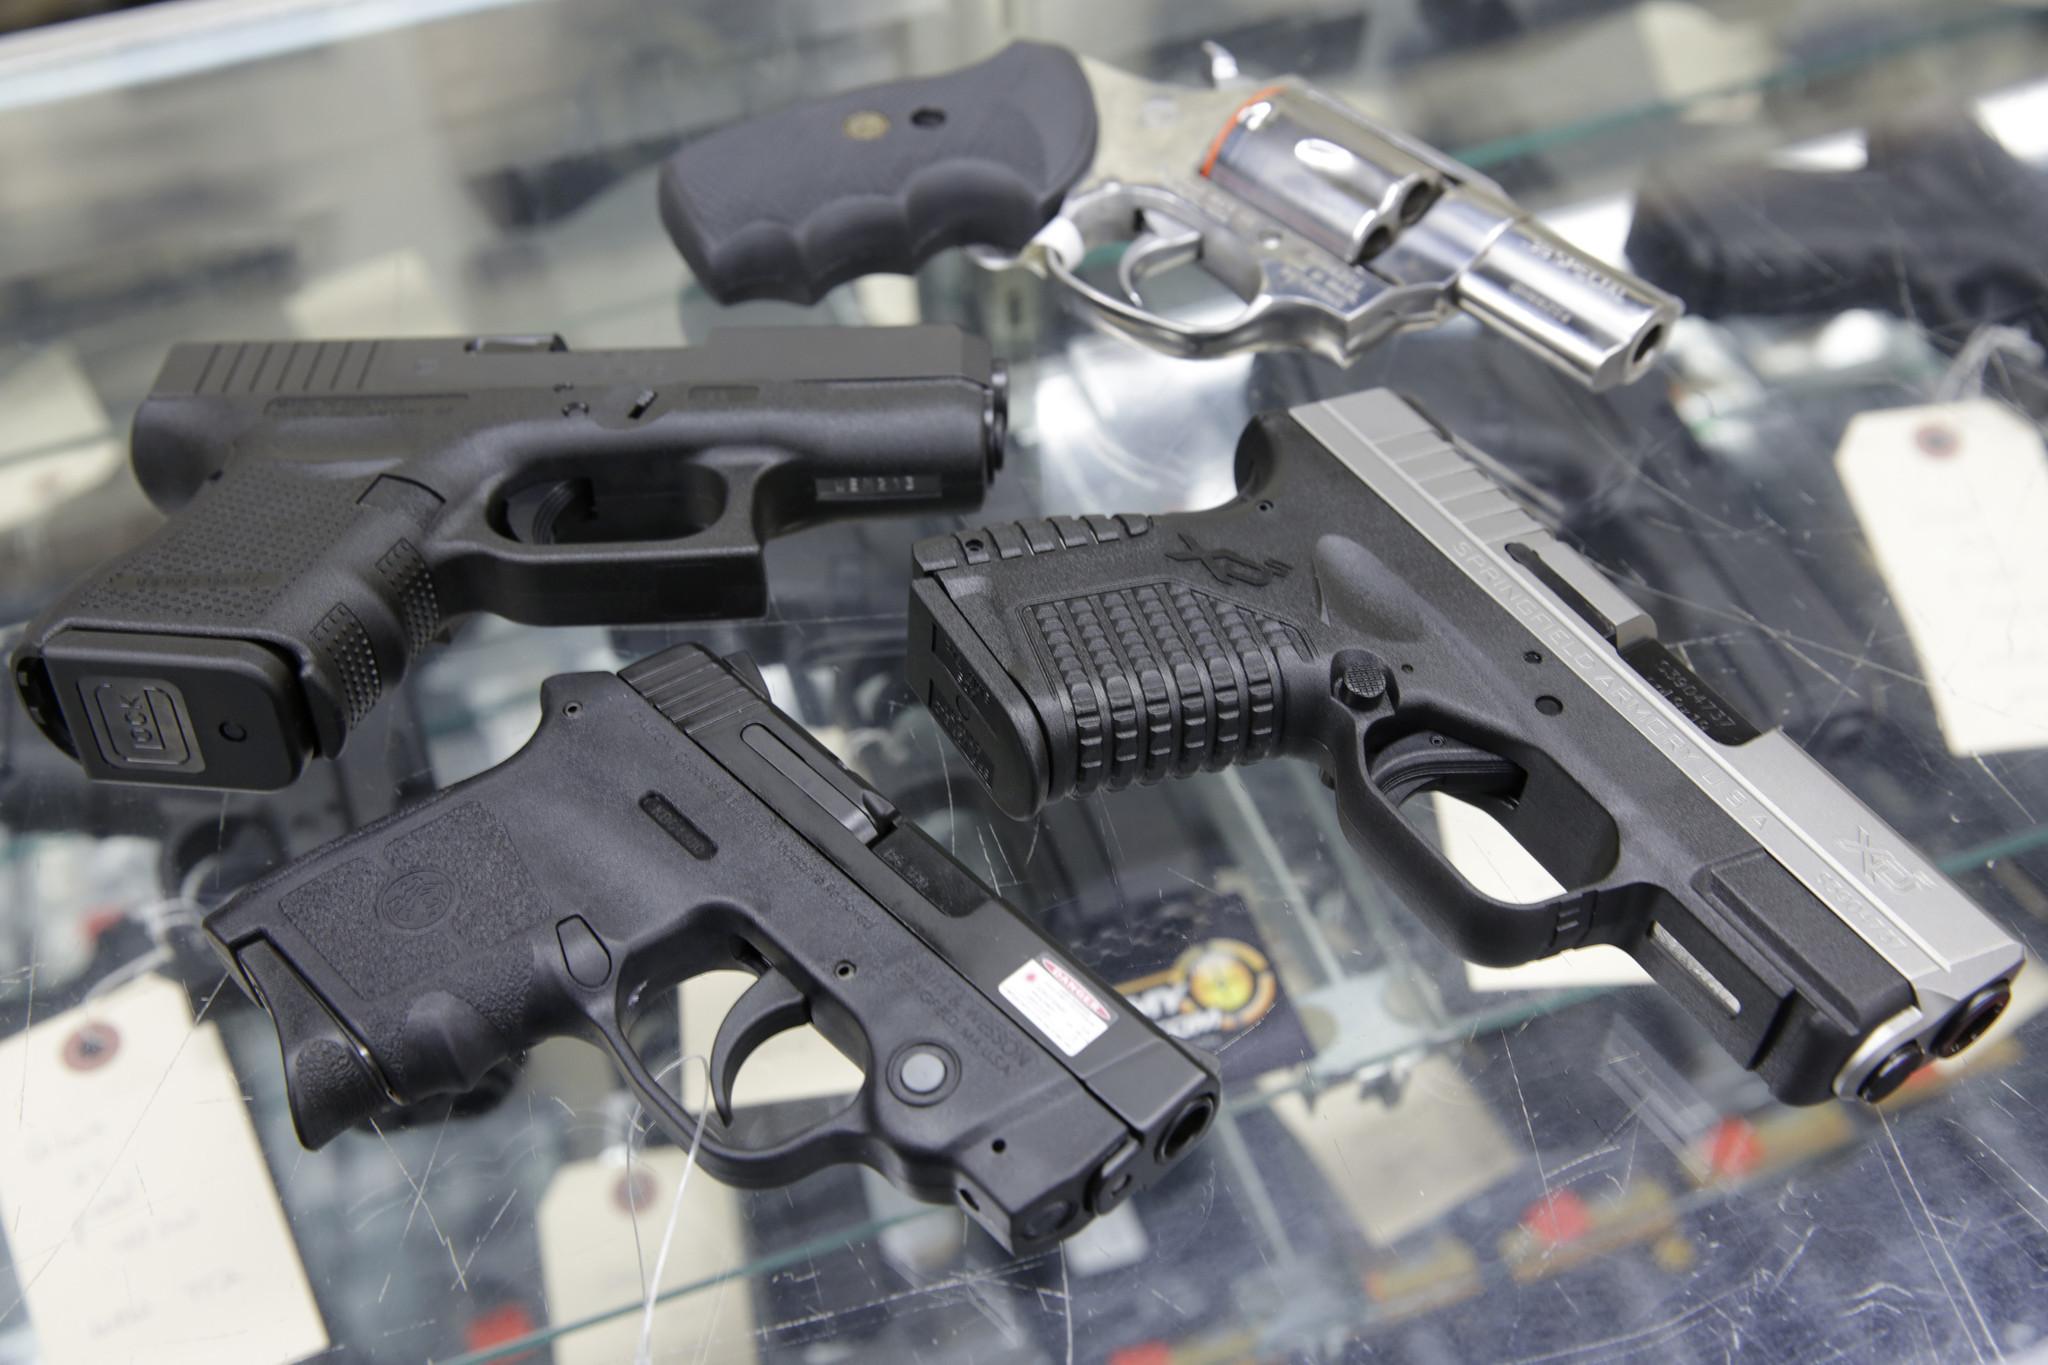 Gun Instructors Lose Certification After Students Report Too Short